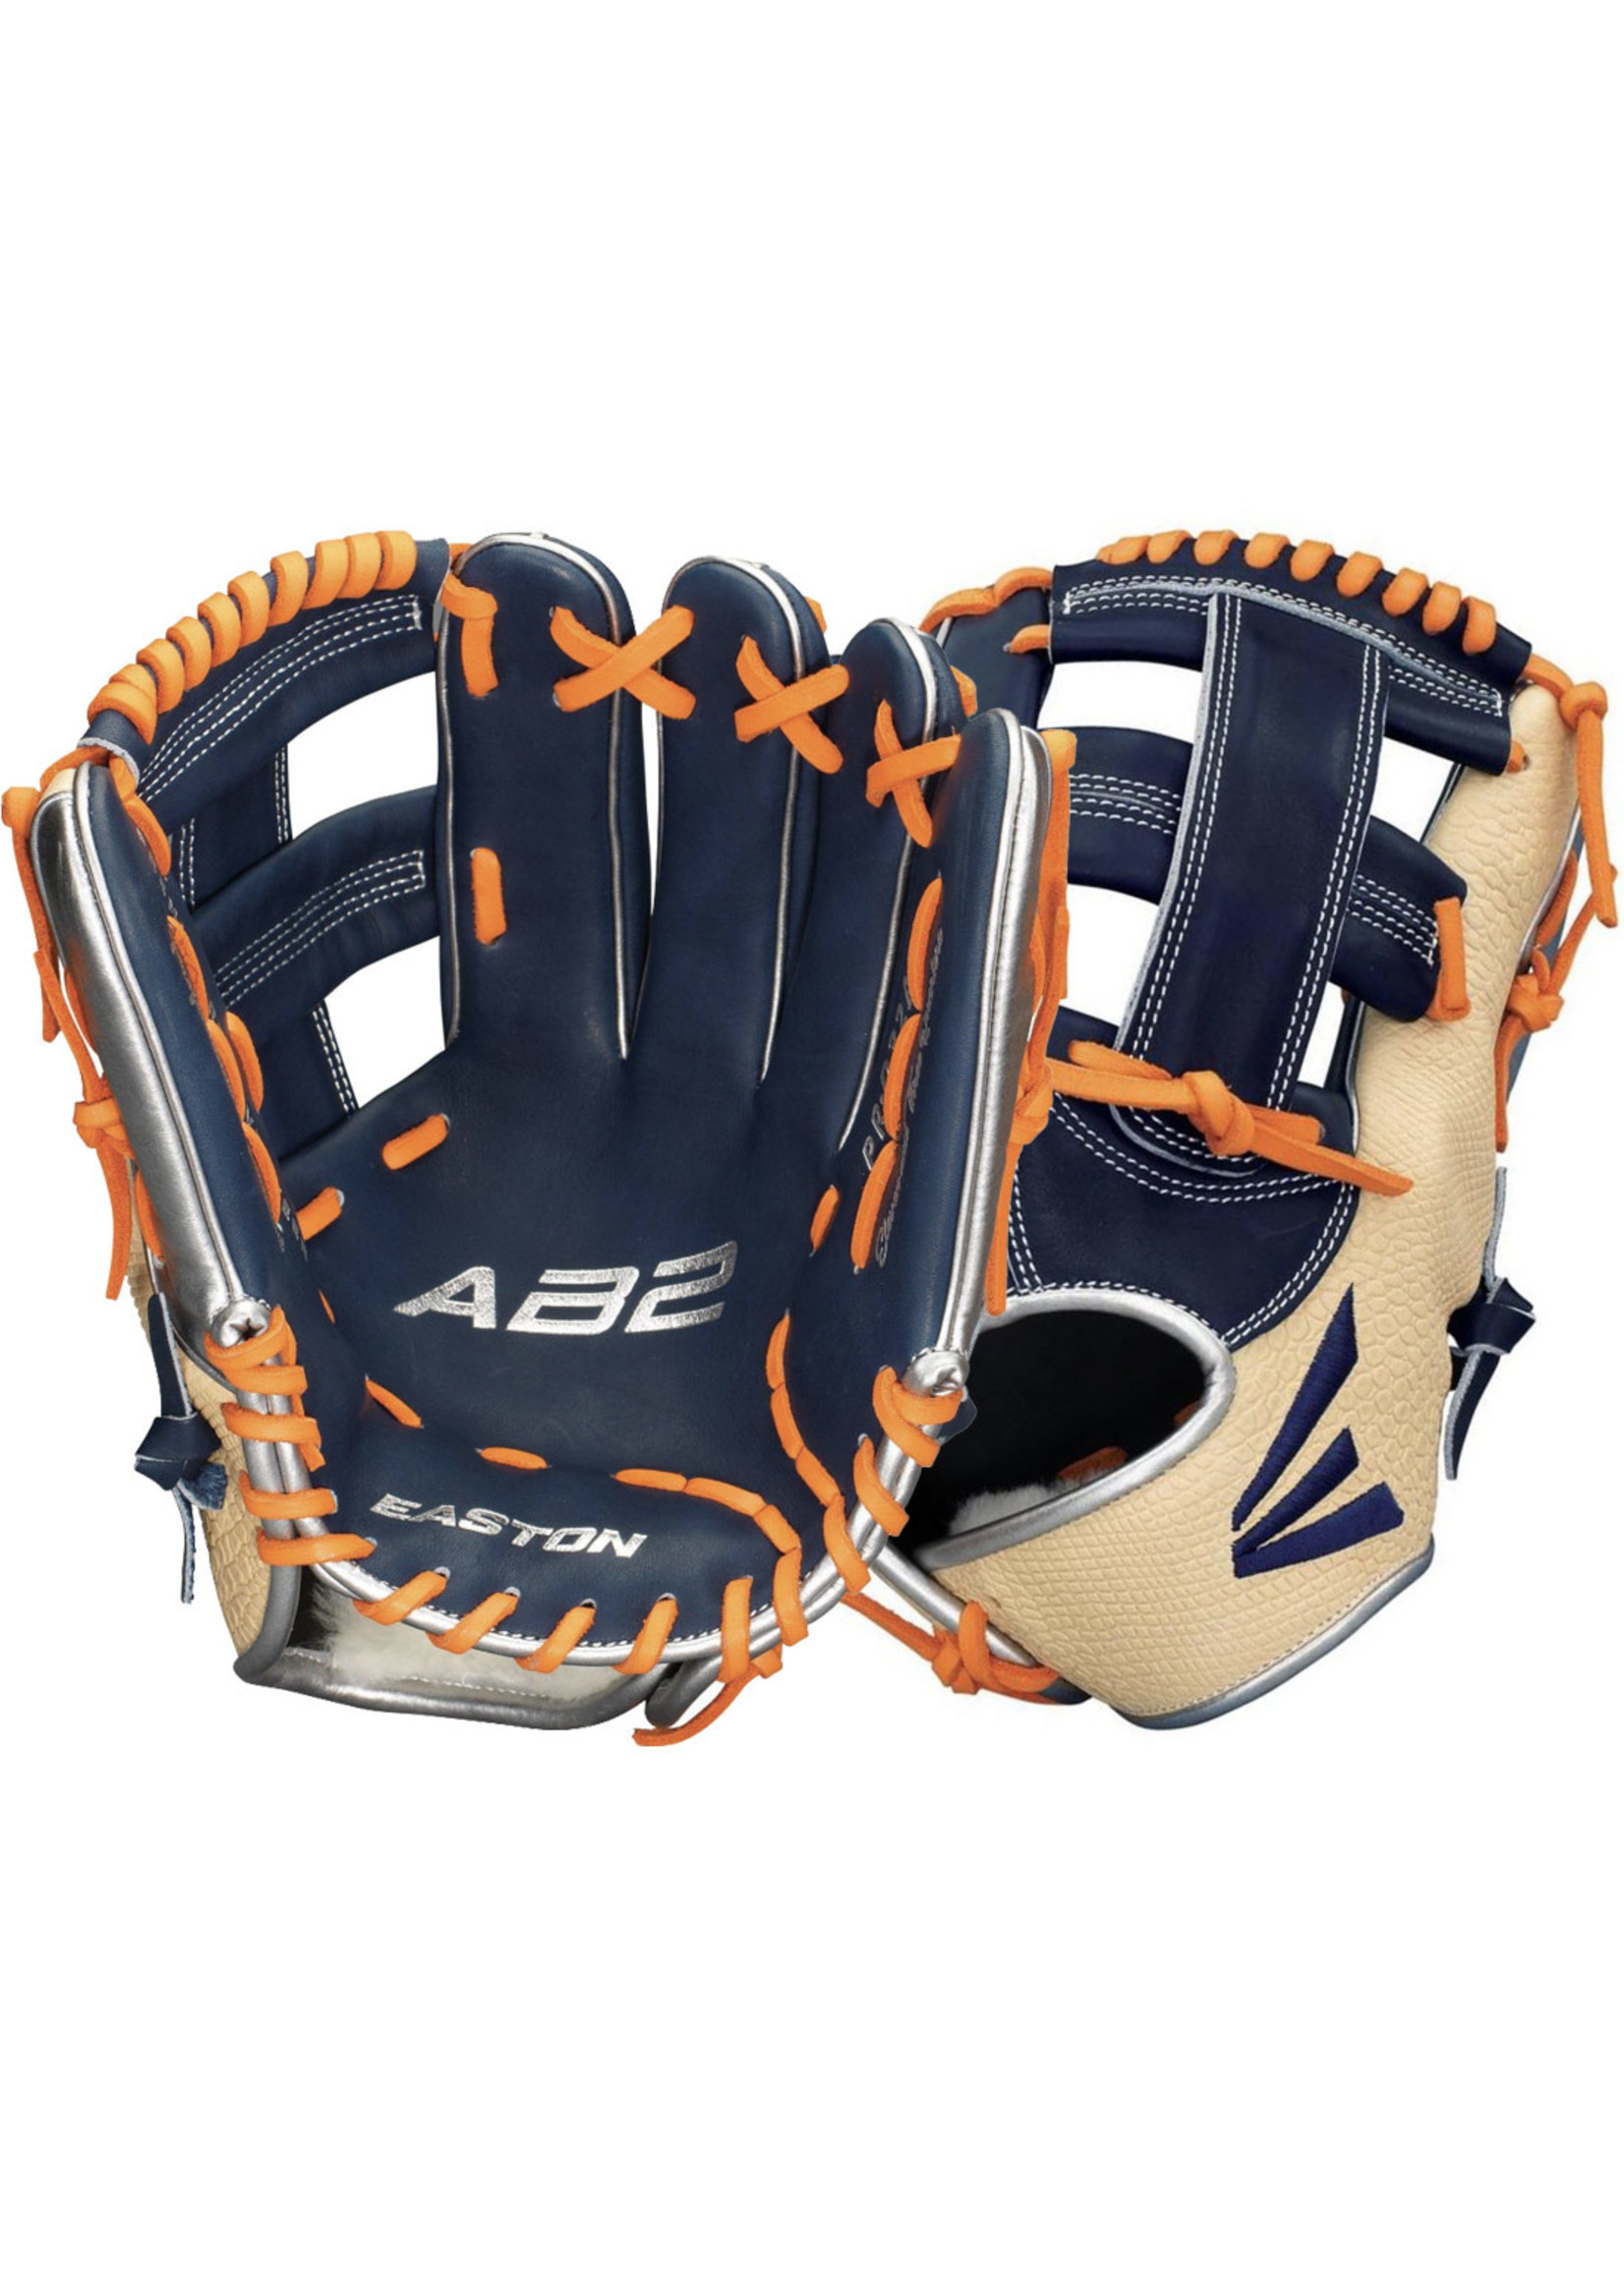 Easton Baseball (Canada) EASTON PRO RESERVE ALEX BREGMAN 11.75'' GLOVE